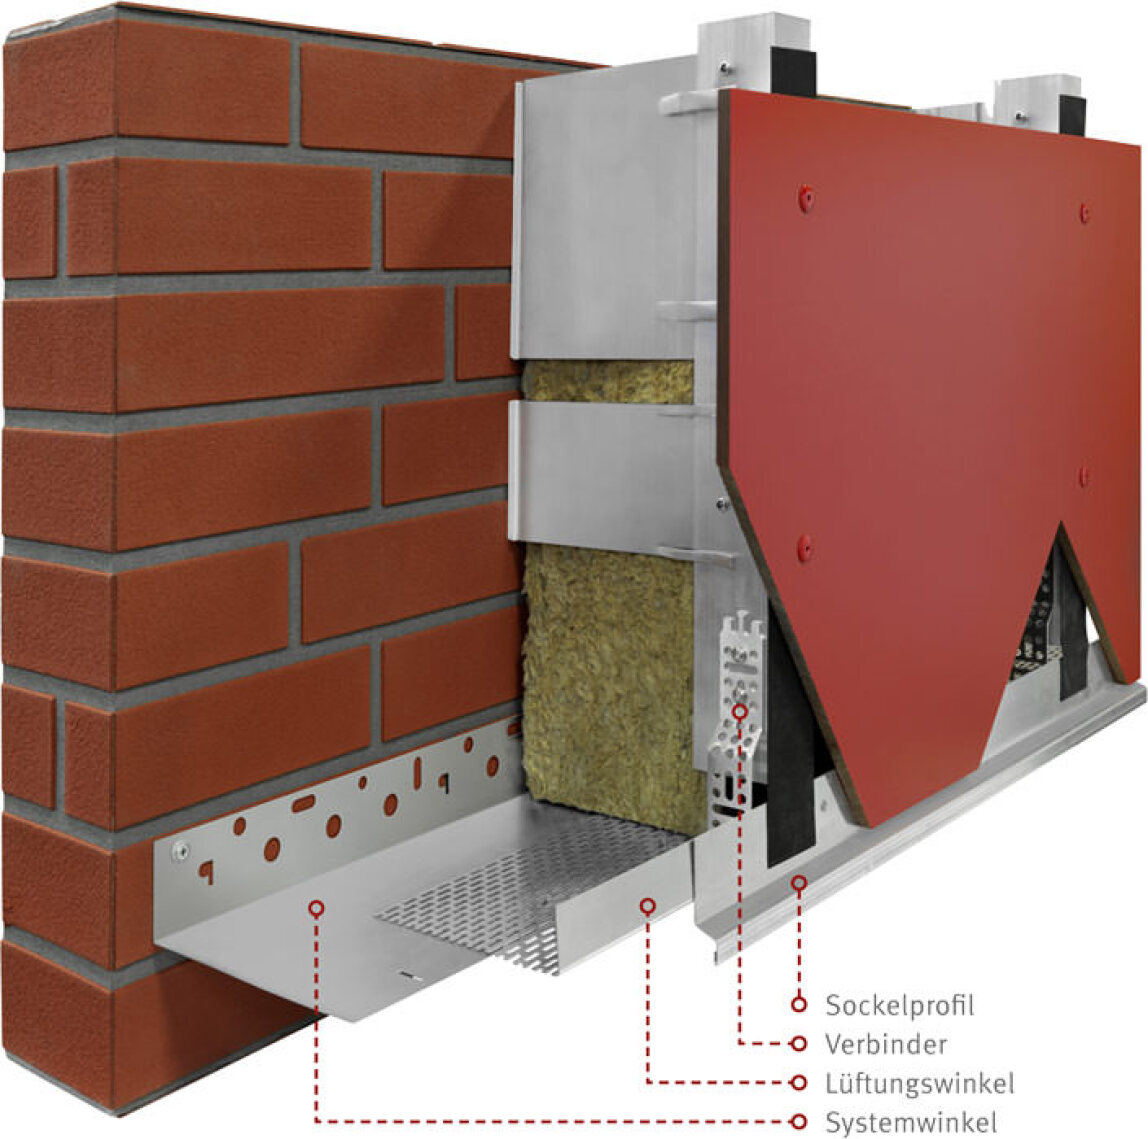 zw ngungsfreies protektor l ftungs system f r vorgeh ngte hinterl ftete fassaden. Black Bedroom Furniture Sets. Home Design Ideas